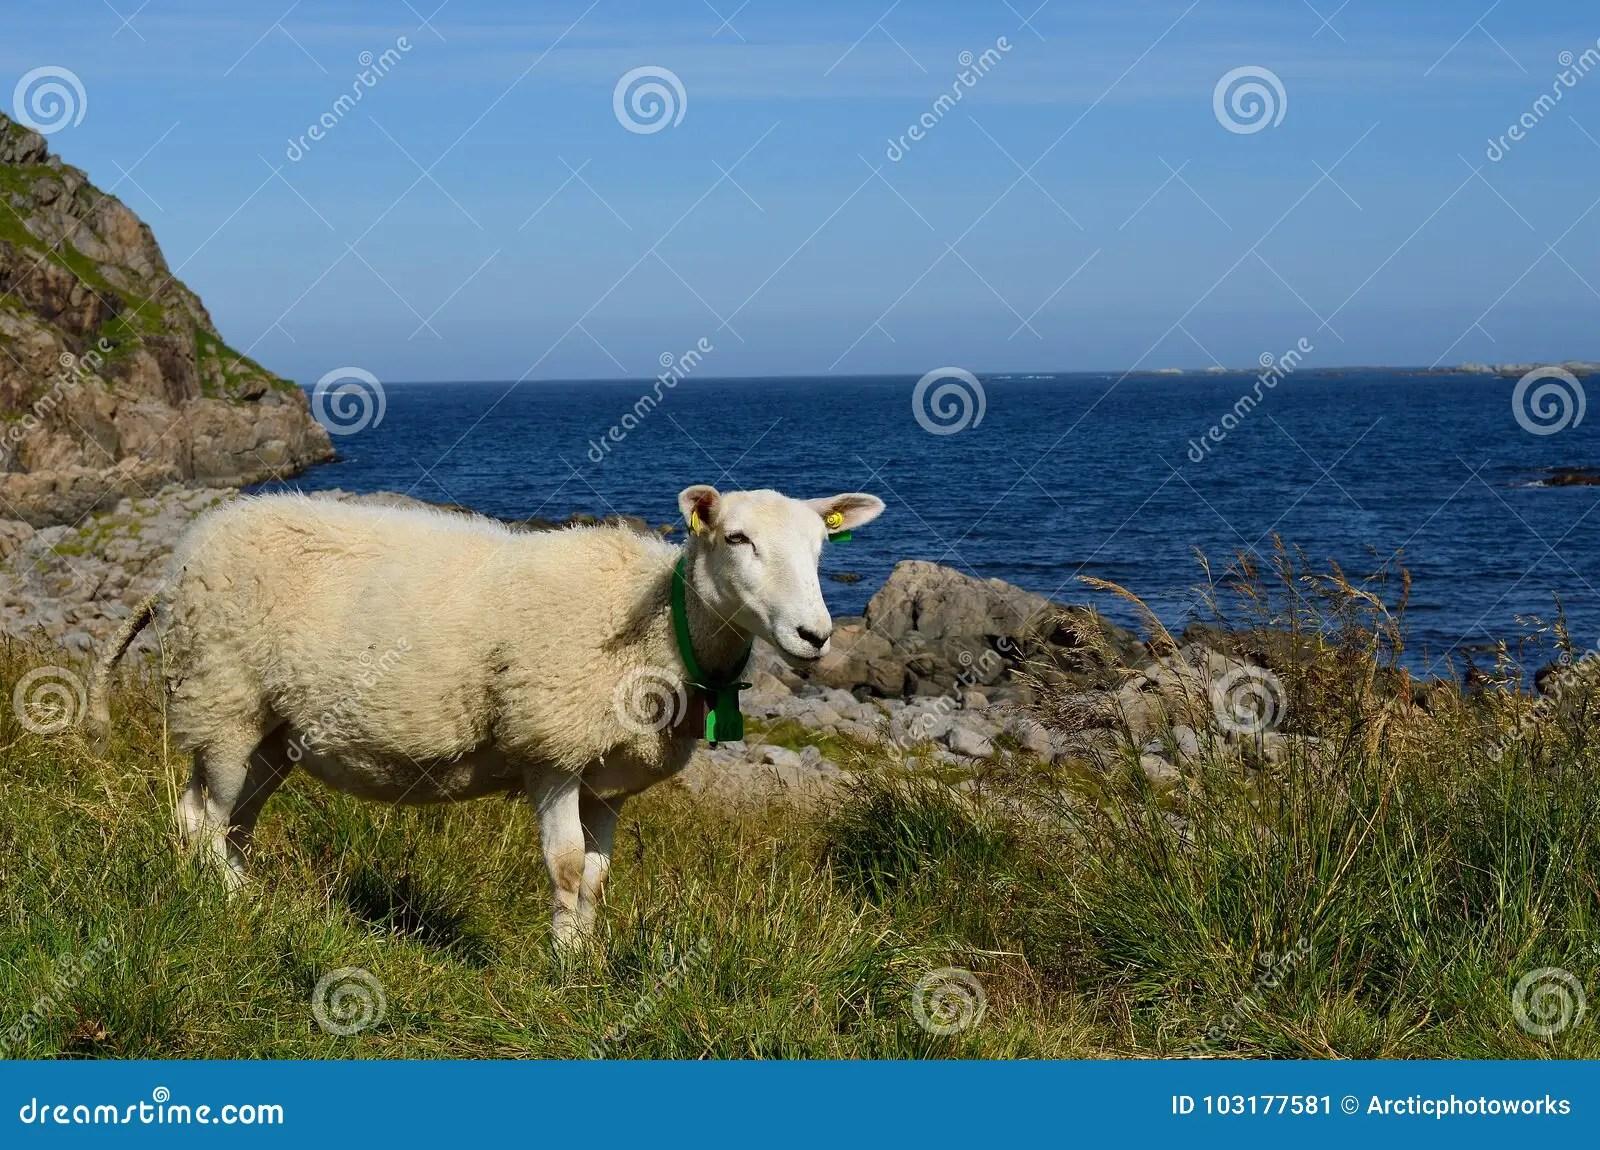 Beautiful Sheep Posing In Front Of Majestic Ocean View